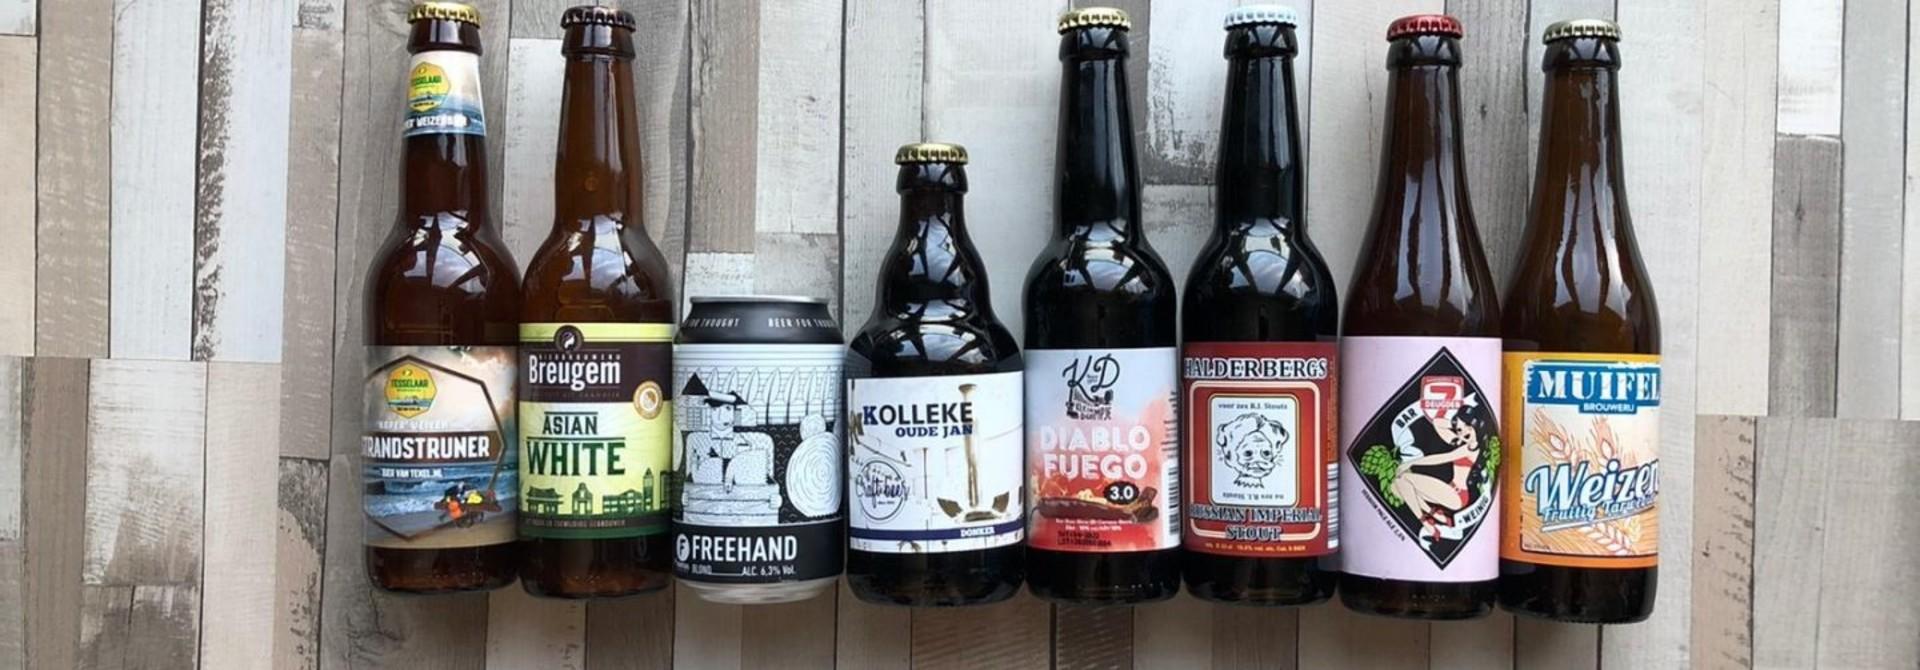 Speciaalbier – bierpakket augustus 2020